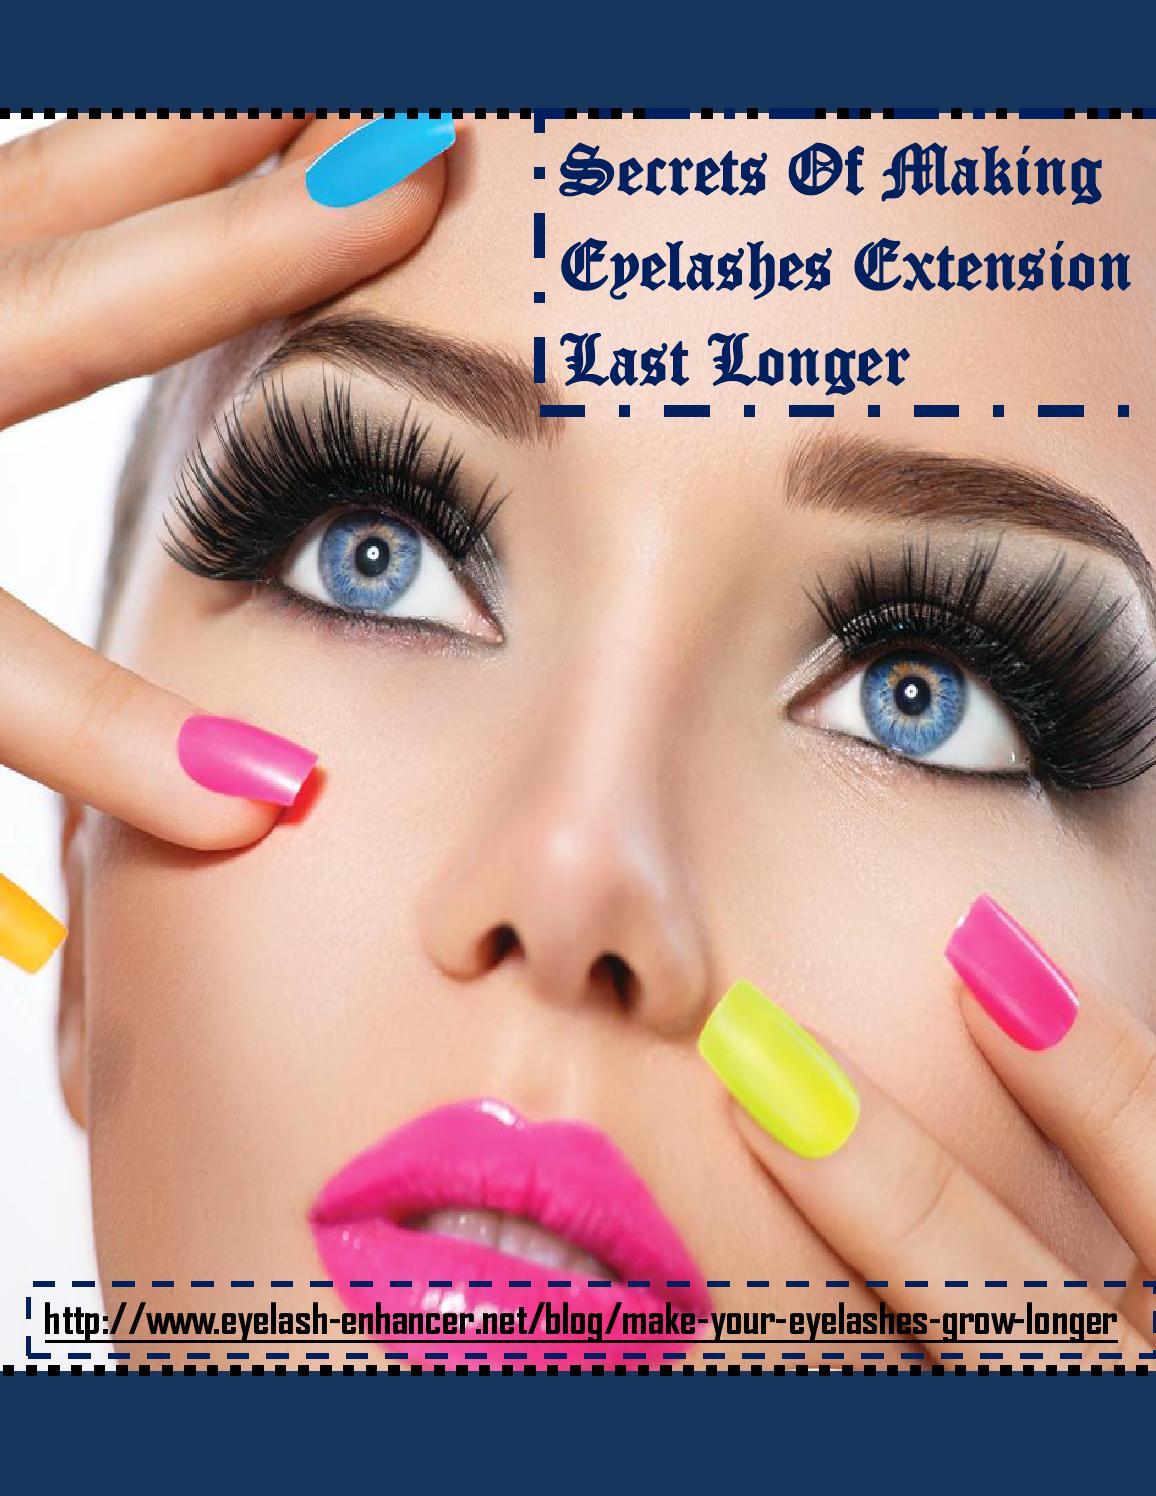 How To Make Your Eyelashes Grow Longer Naturally By Eyalash Enhancer